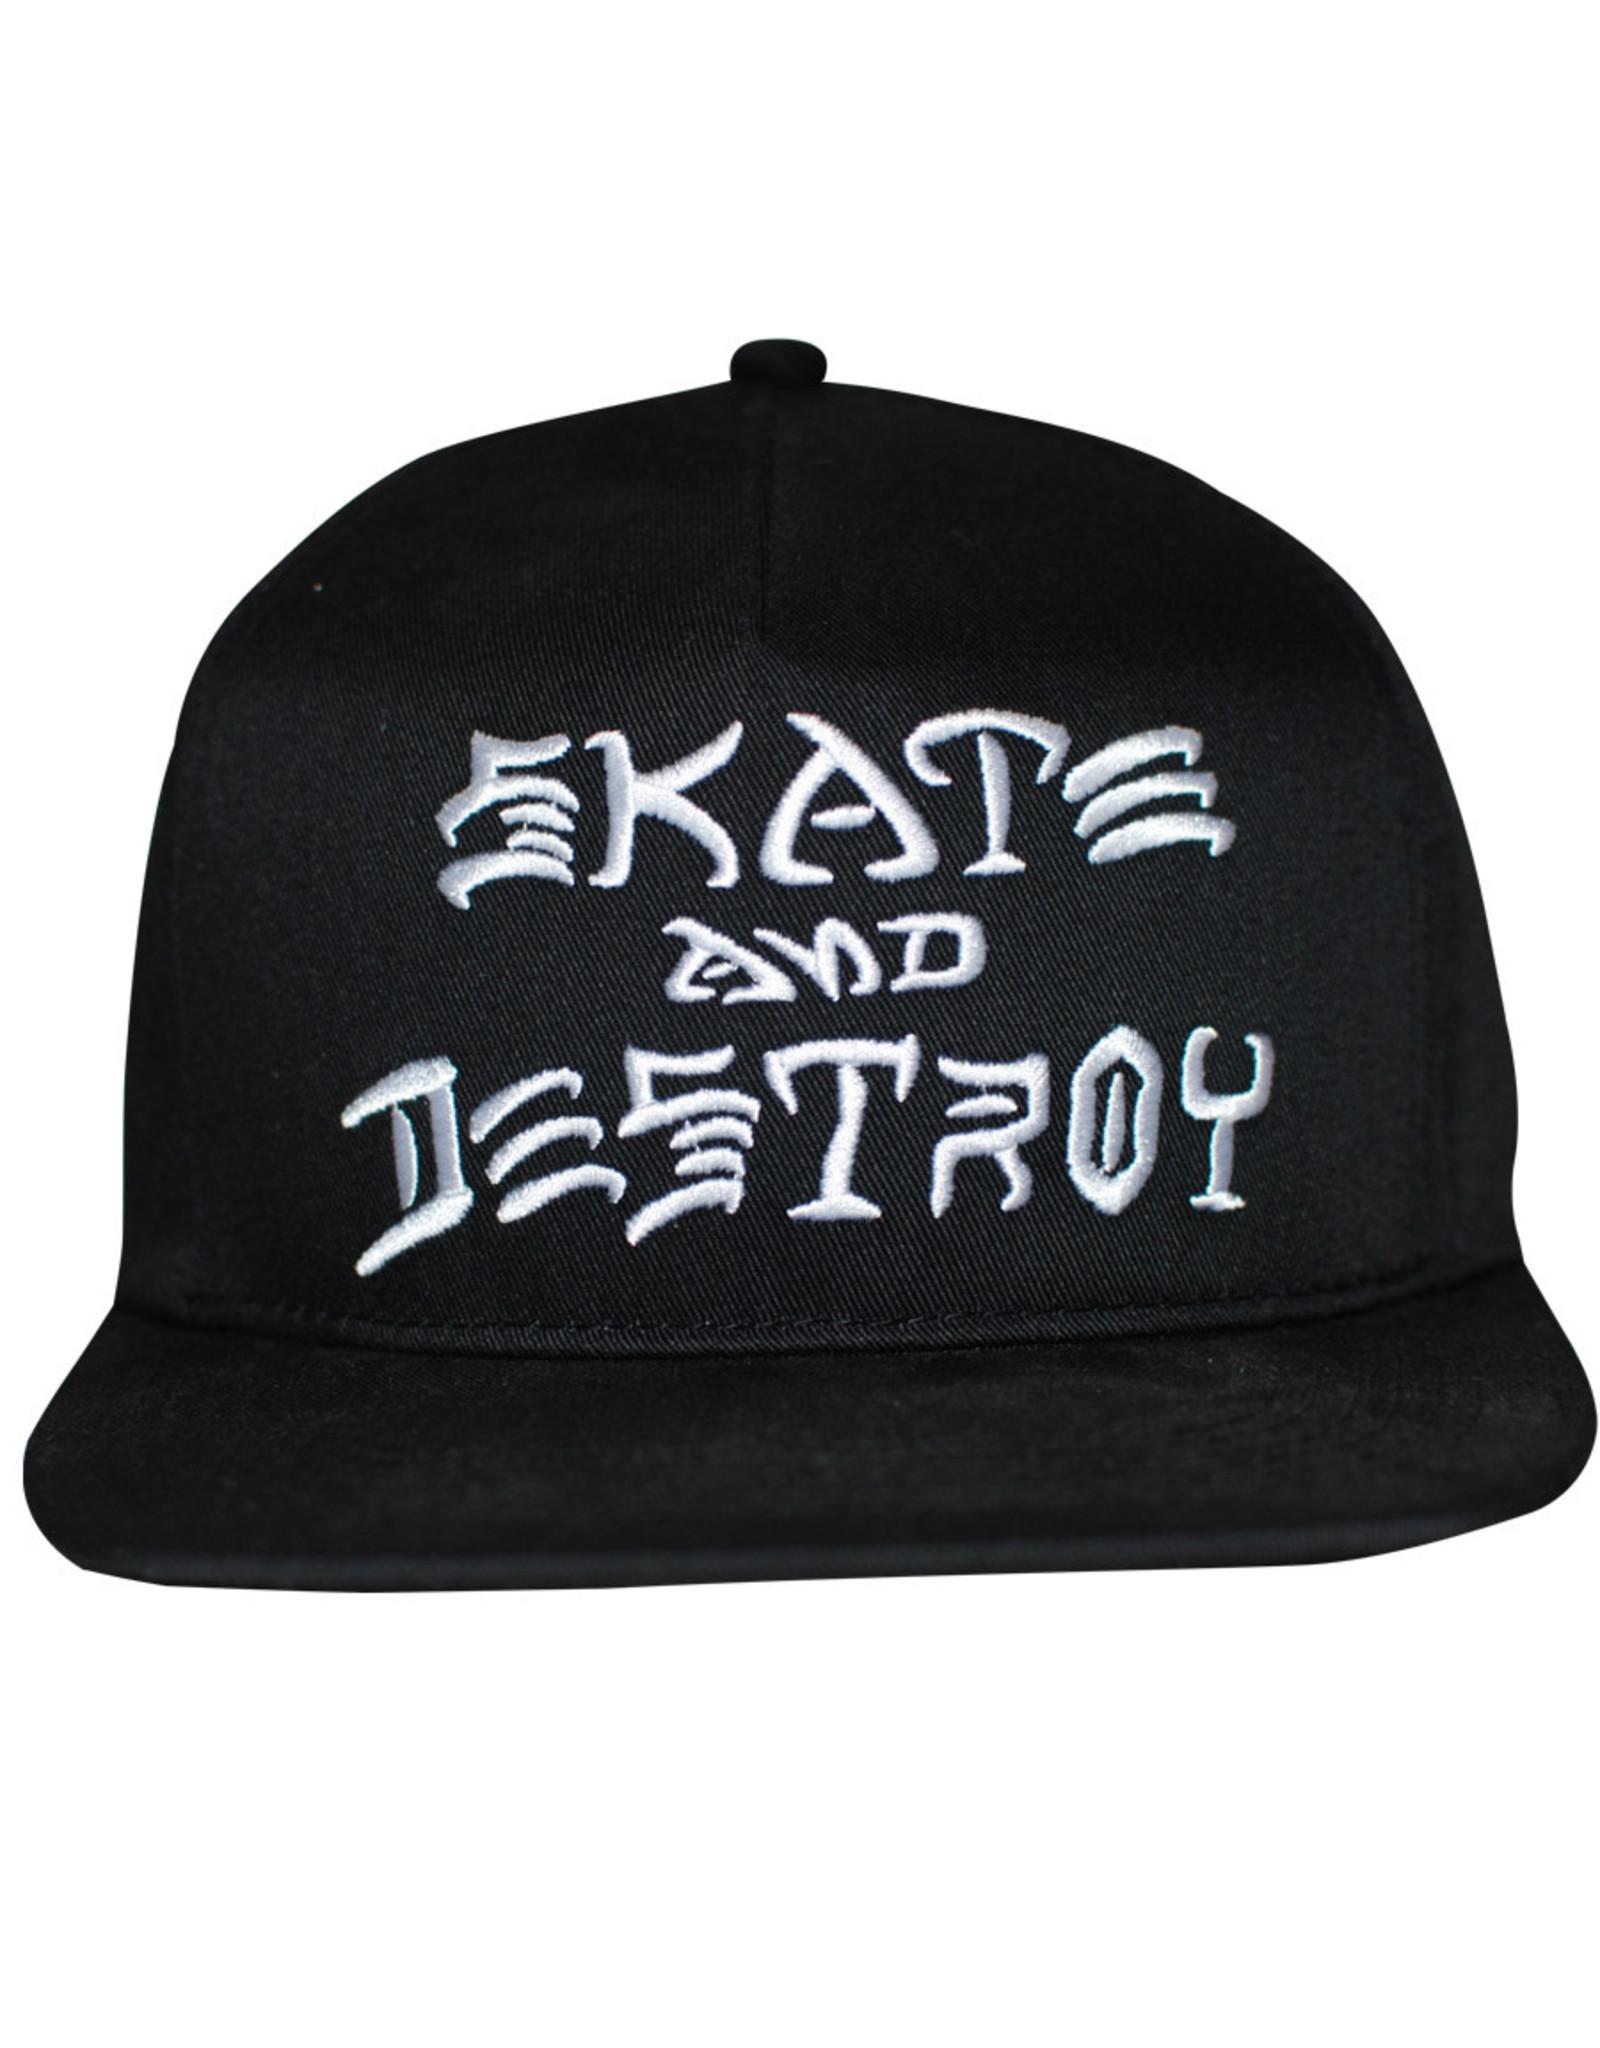 Thrasher Thrasher Hat Sk8 And Destroy Embroidered Snapback (Black/White)